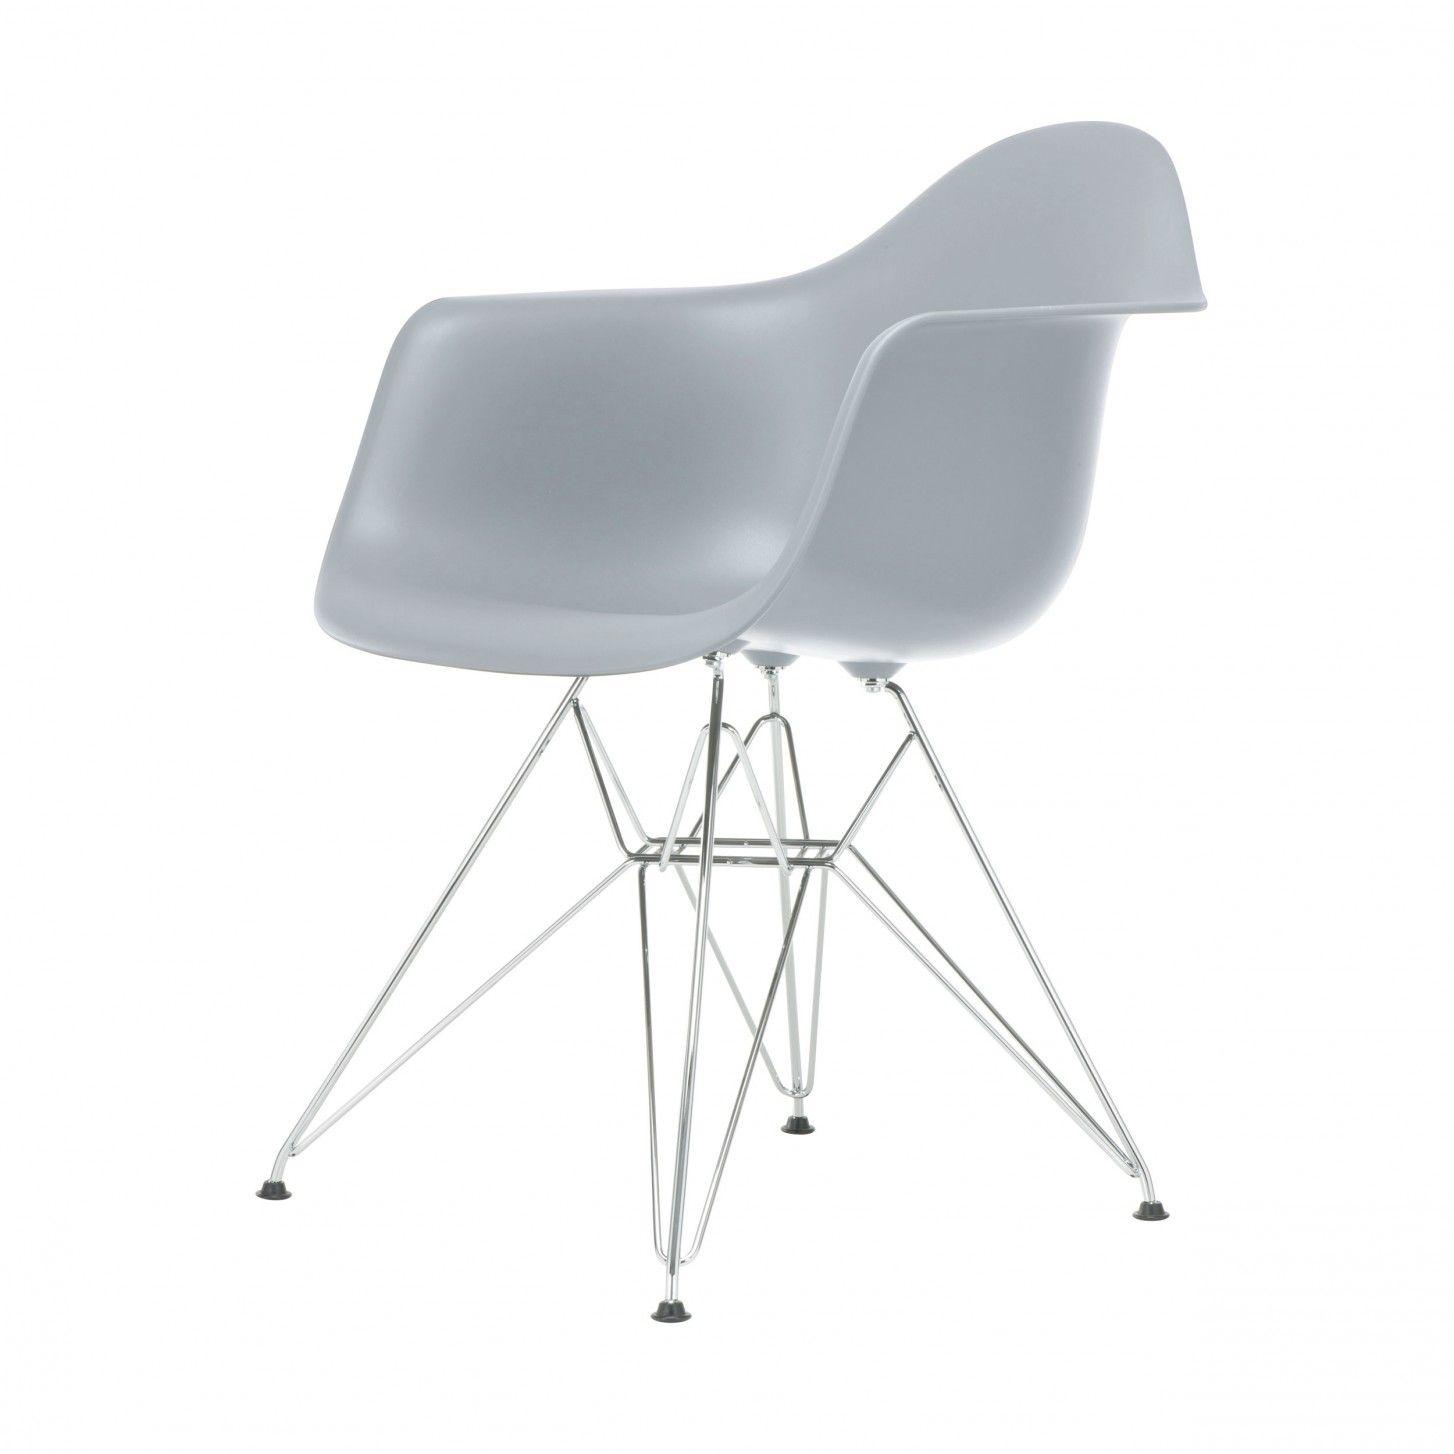 Designer Stuhl Eames original vitra eames plastic armchair dar bei ikarus design